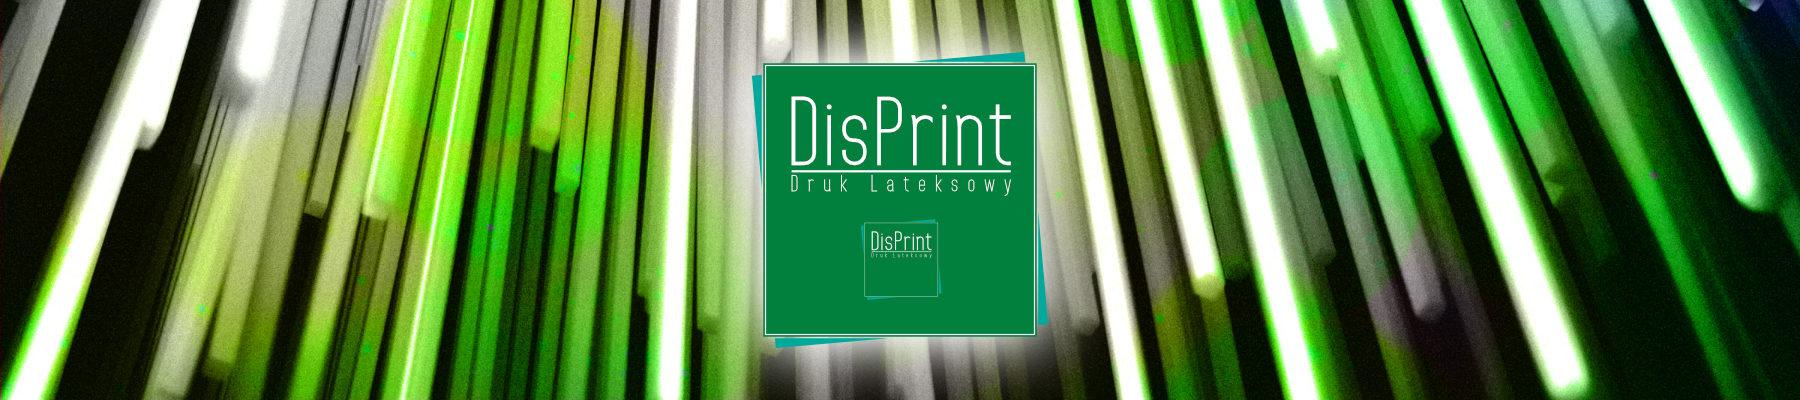 DisPrint